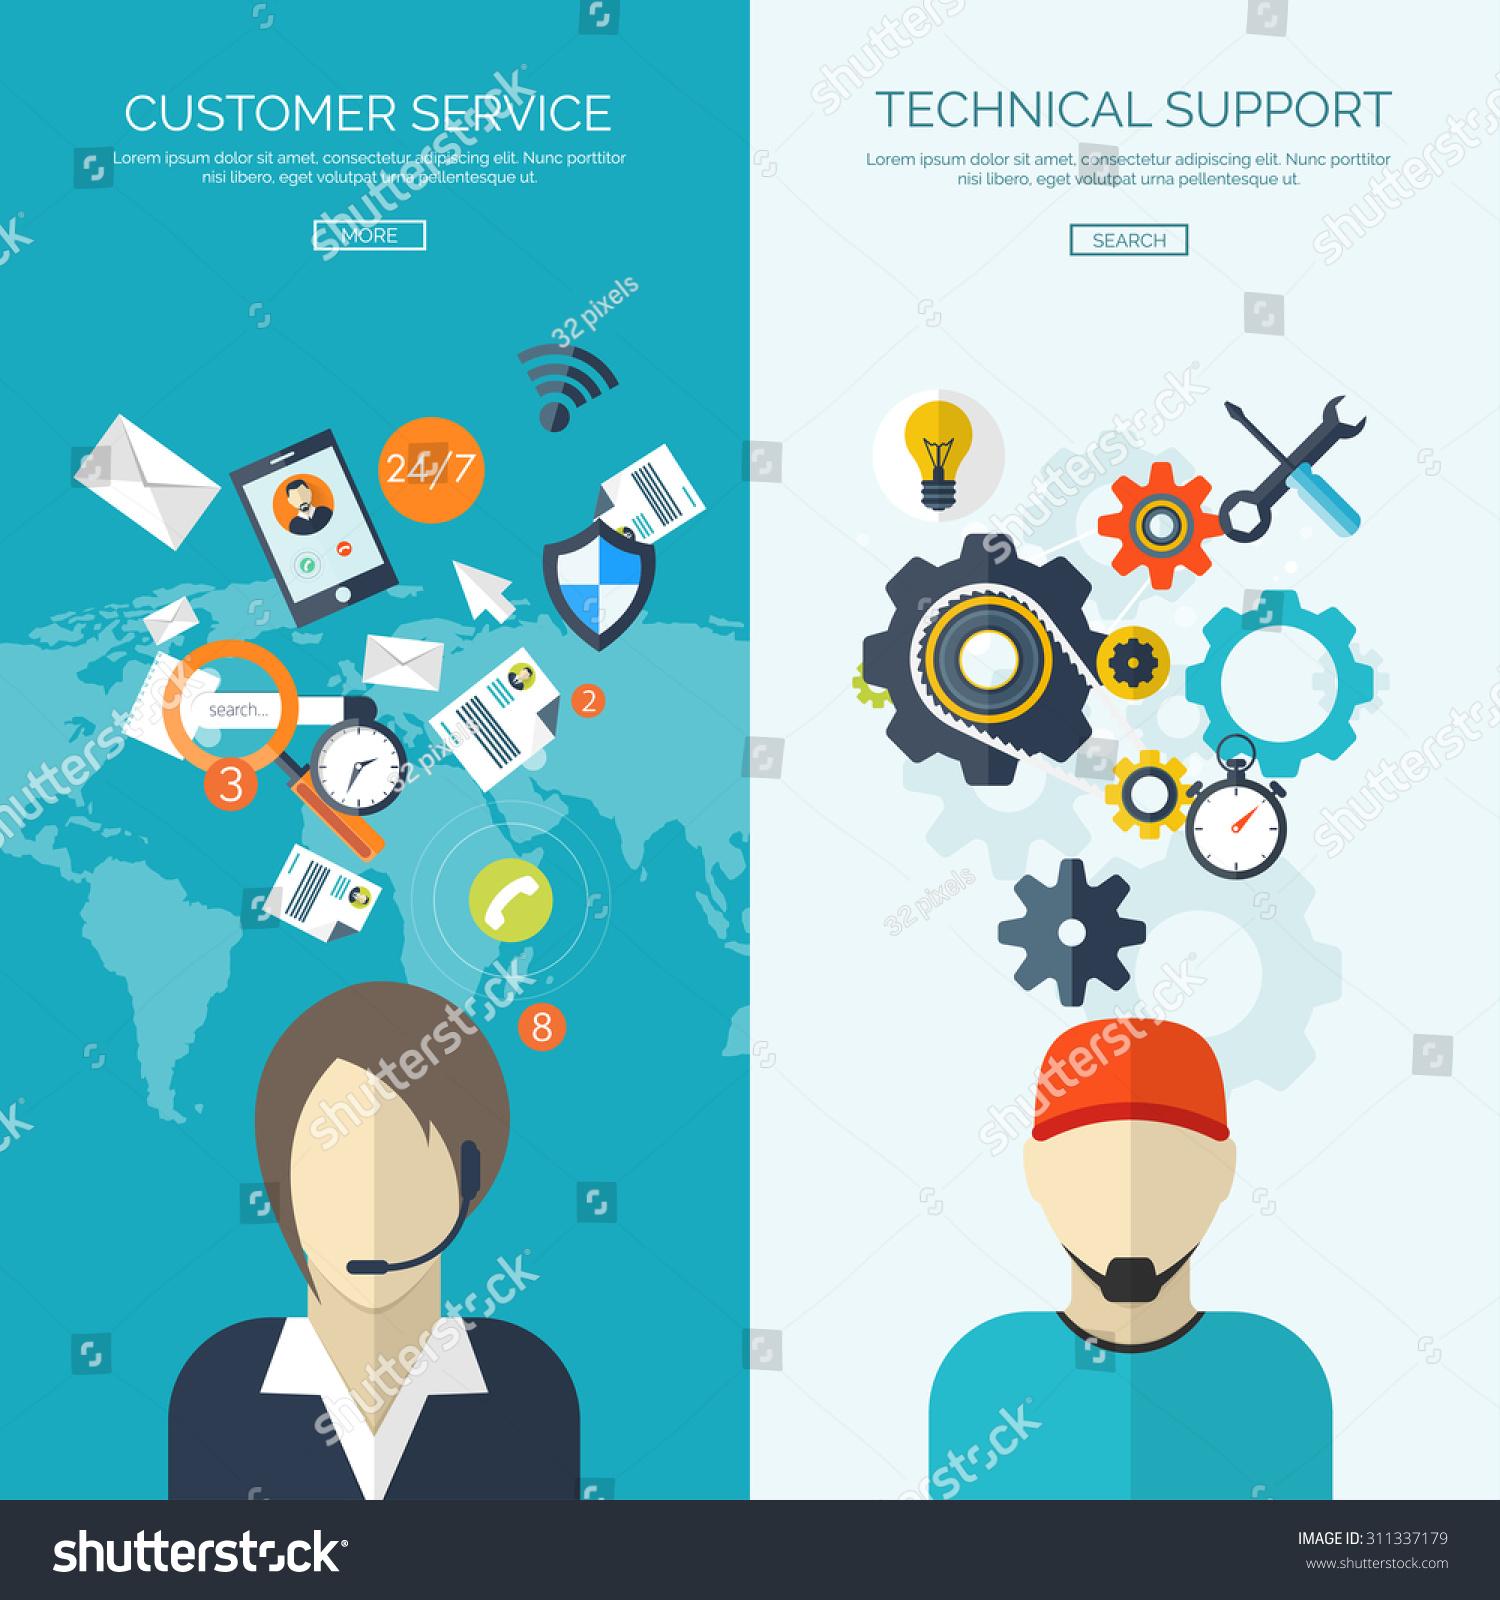 Flat Vector Illustration Customer Service Online Stock